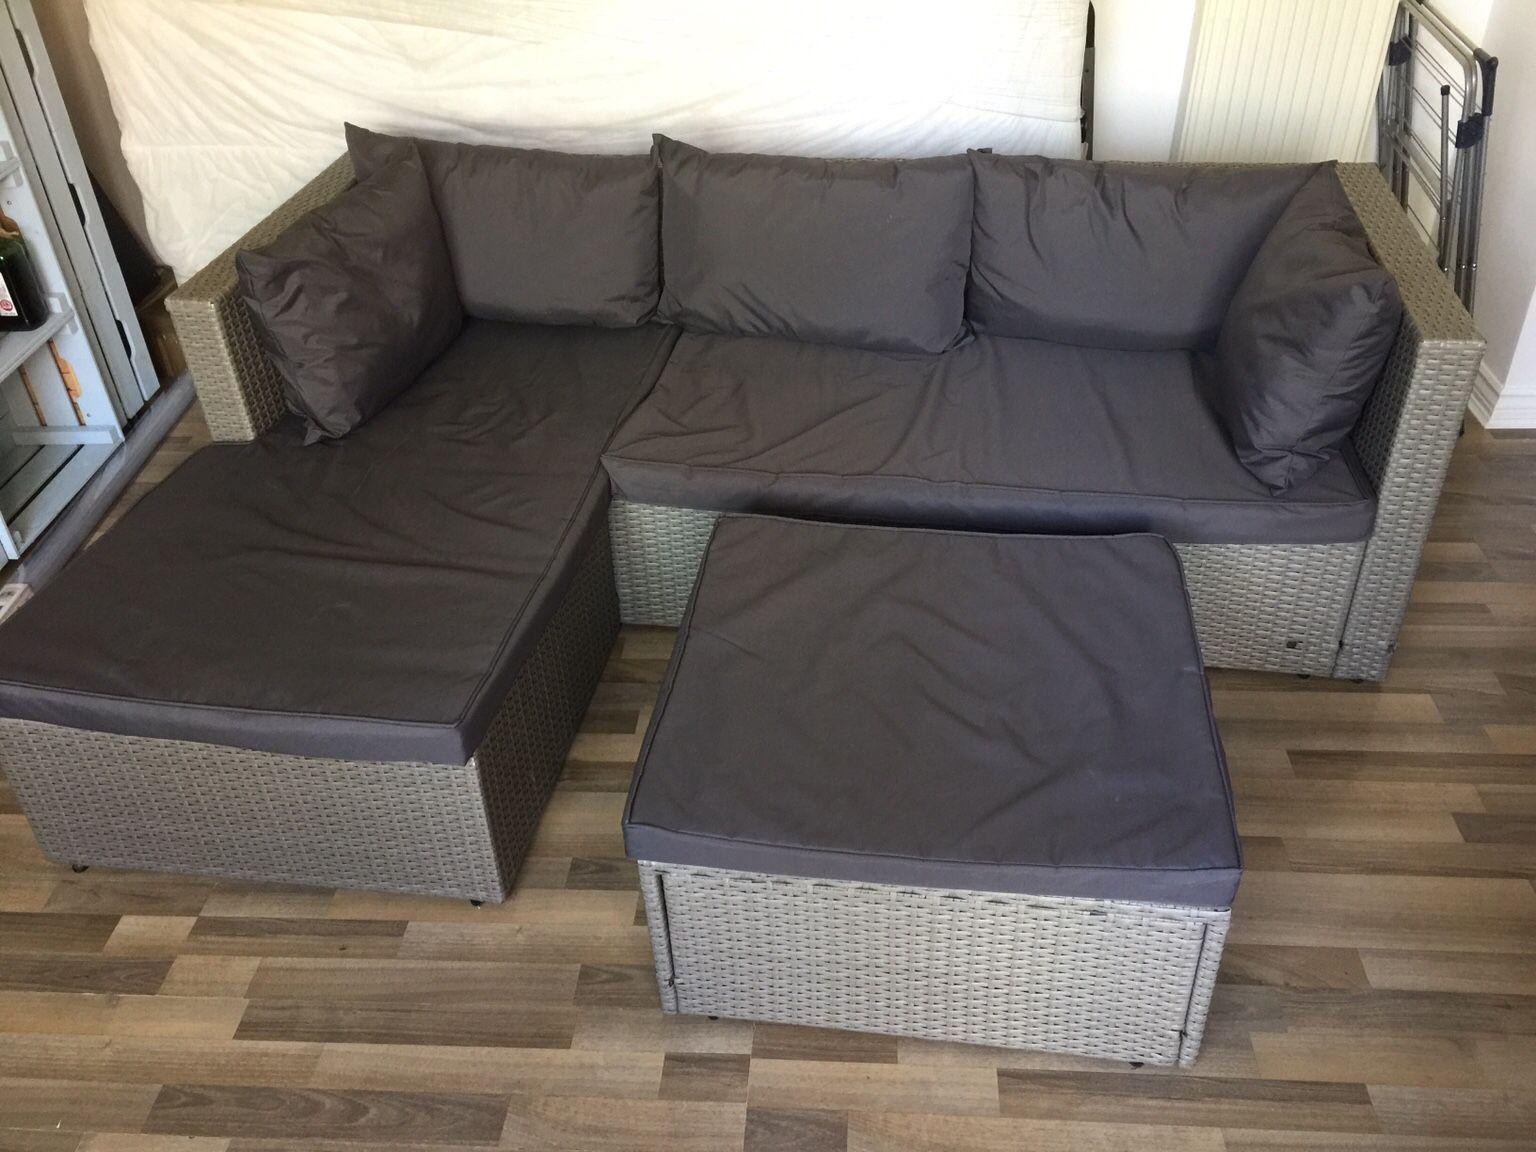 Rattan Effect Corner Sofa Set Cover Aldi di 2020